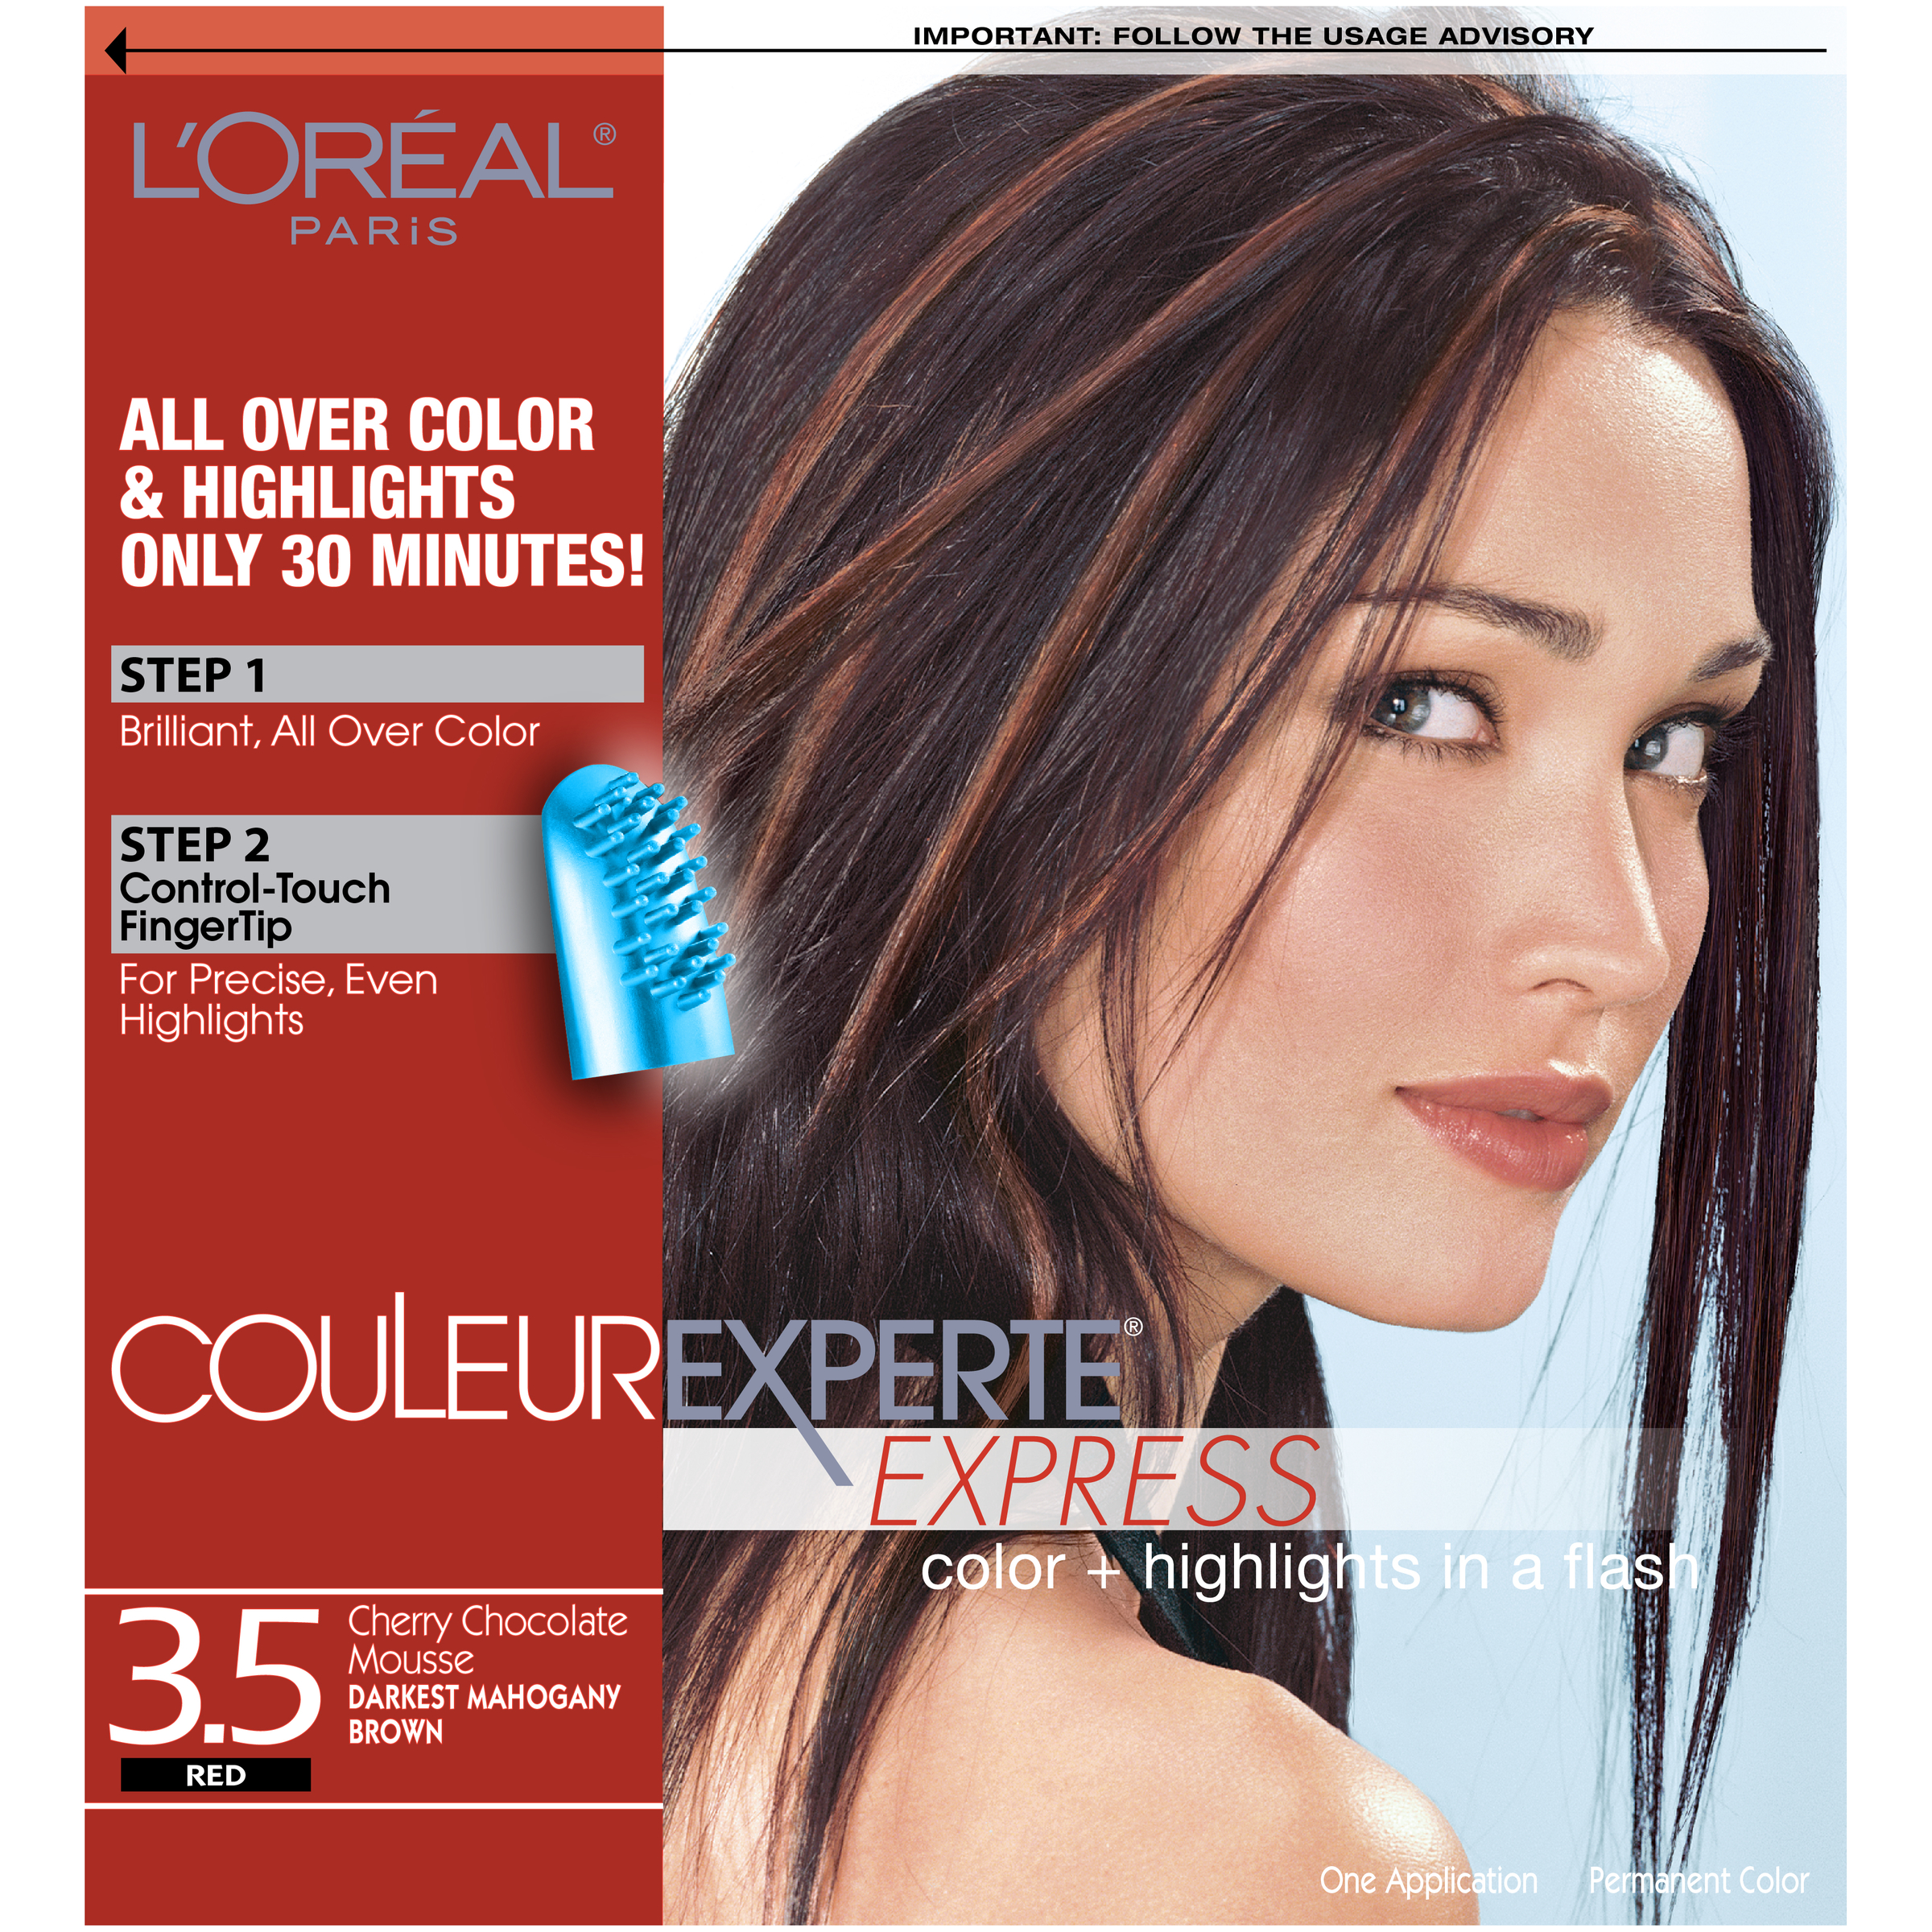 Loreal Paris Couleur Experte Express Hair Color 35 Red Cherry